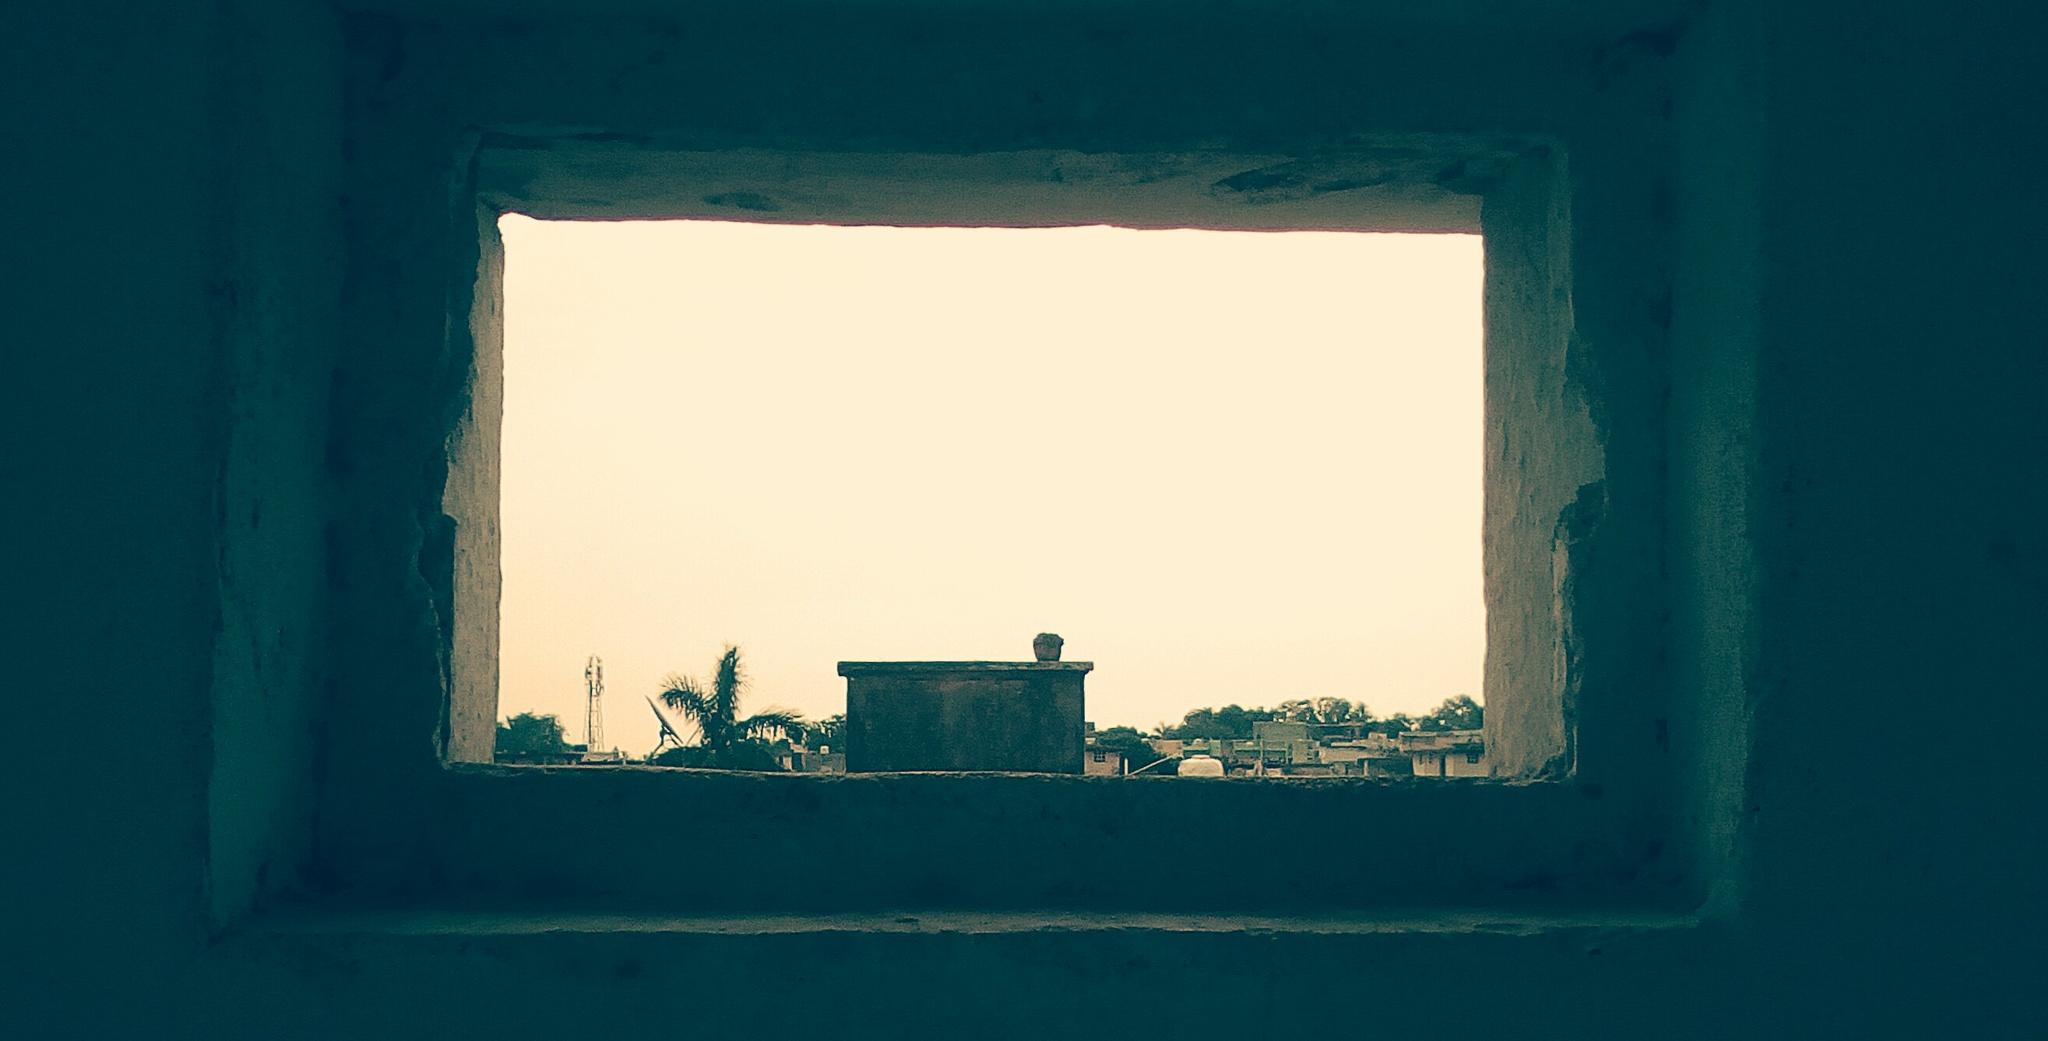 Framed by ManMohanSingh